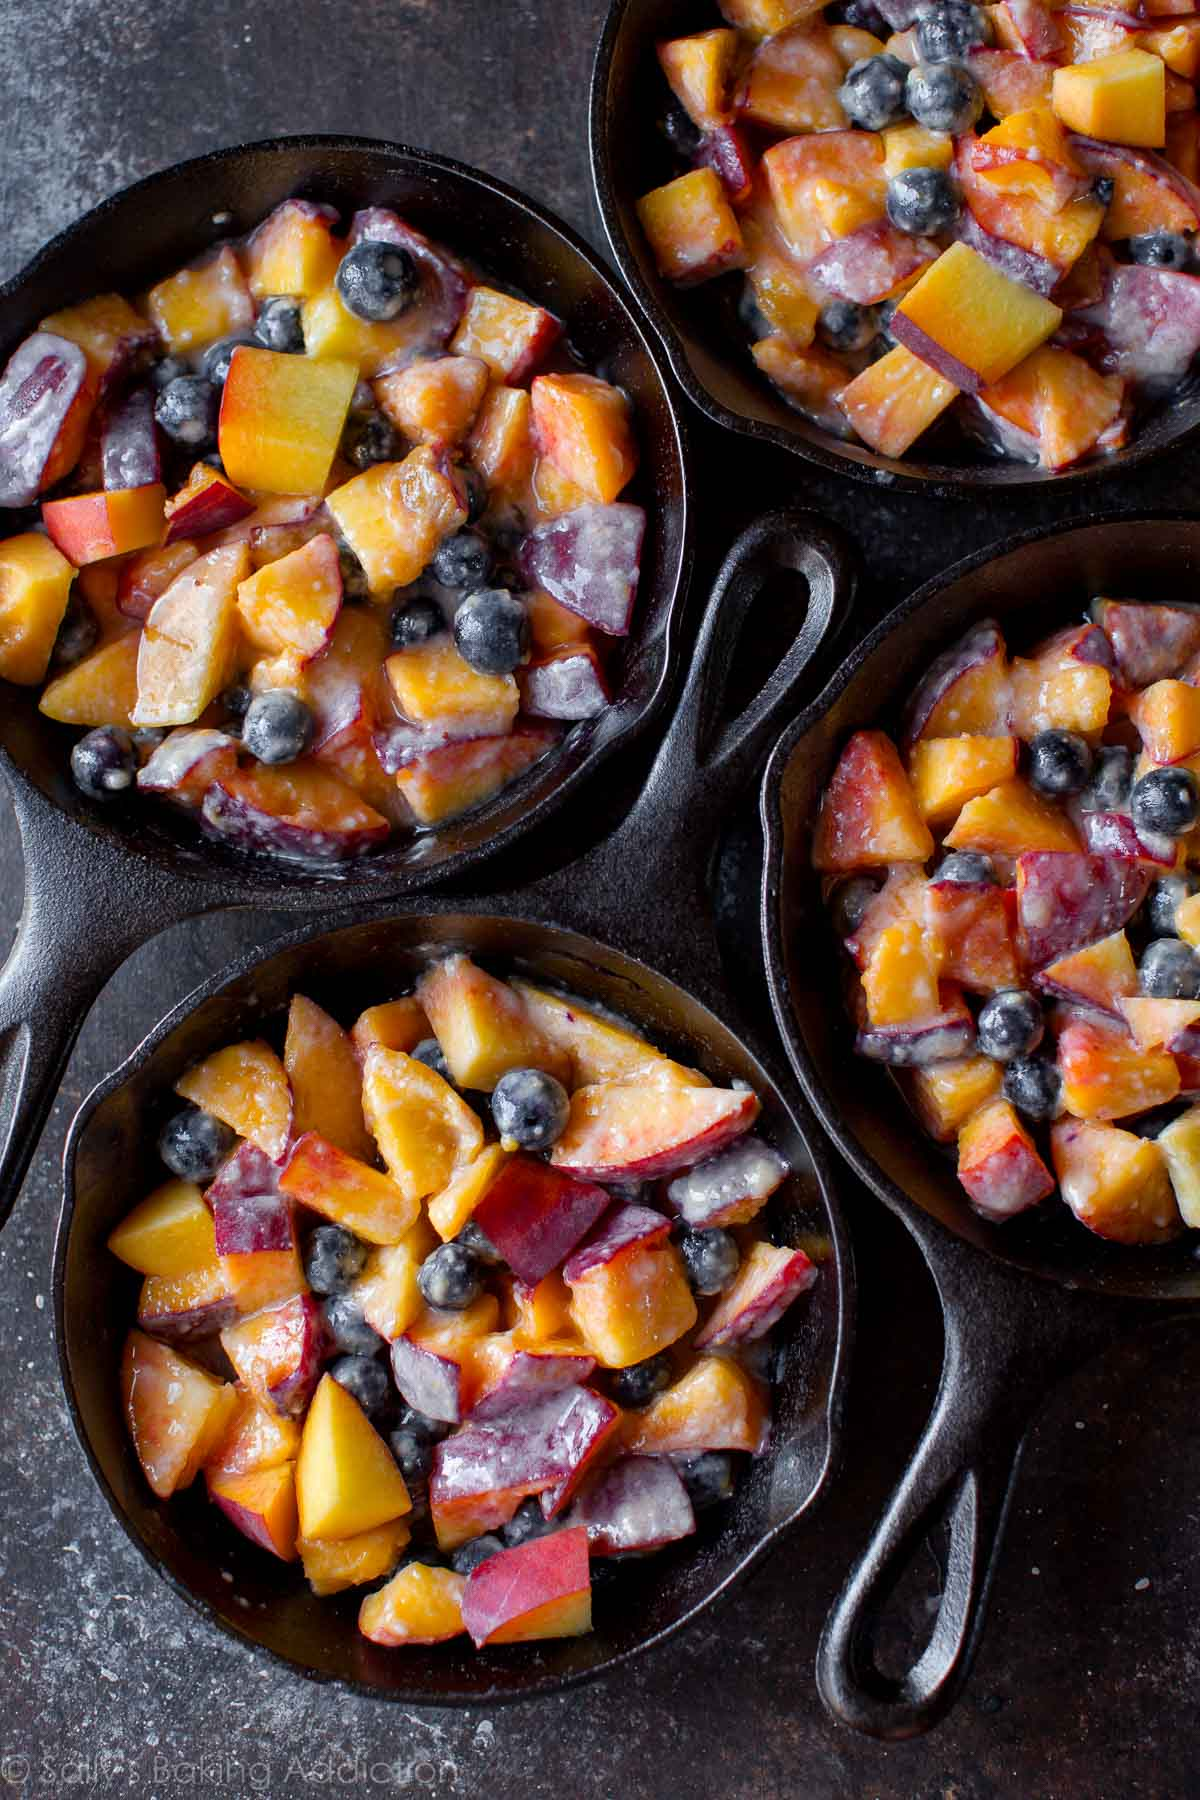 Blueberry peach crisp recipe on sallysbakingaddiction.com